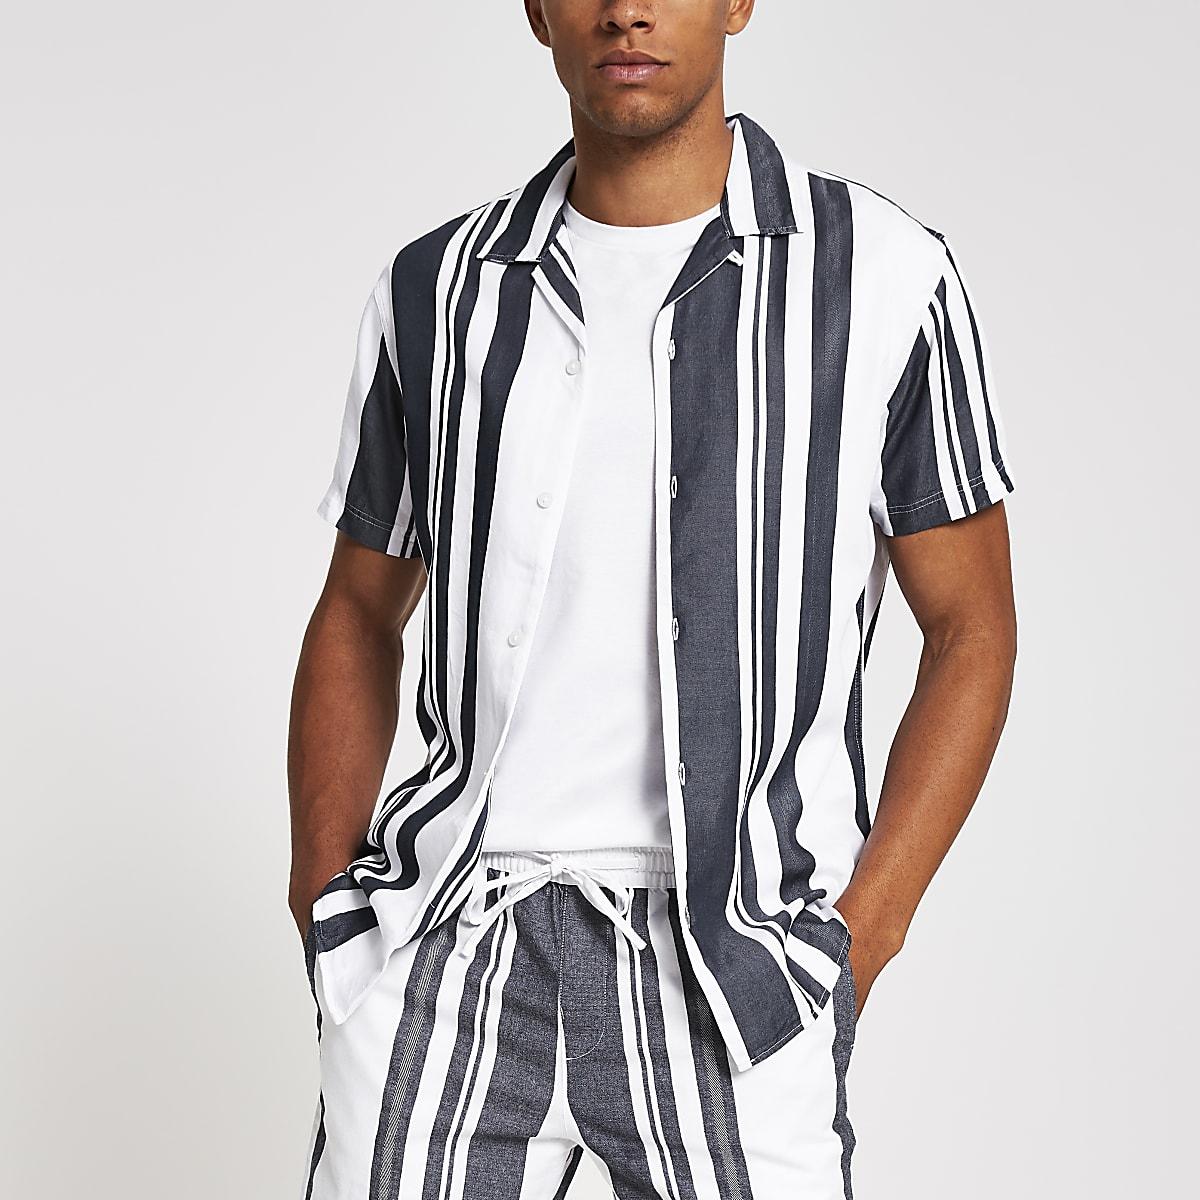 Selected Homme - Marinebalues Regular Fit Hemd mit Streifen